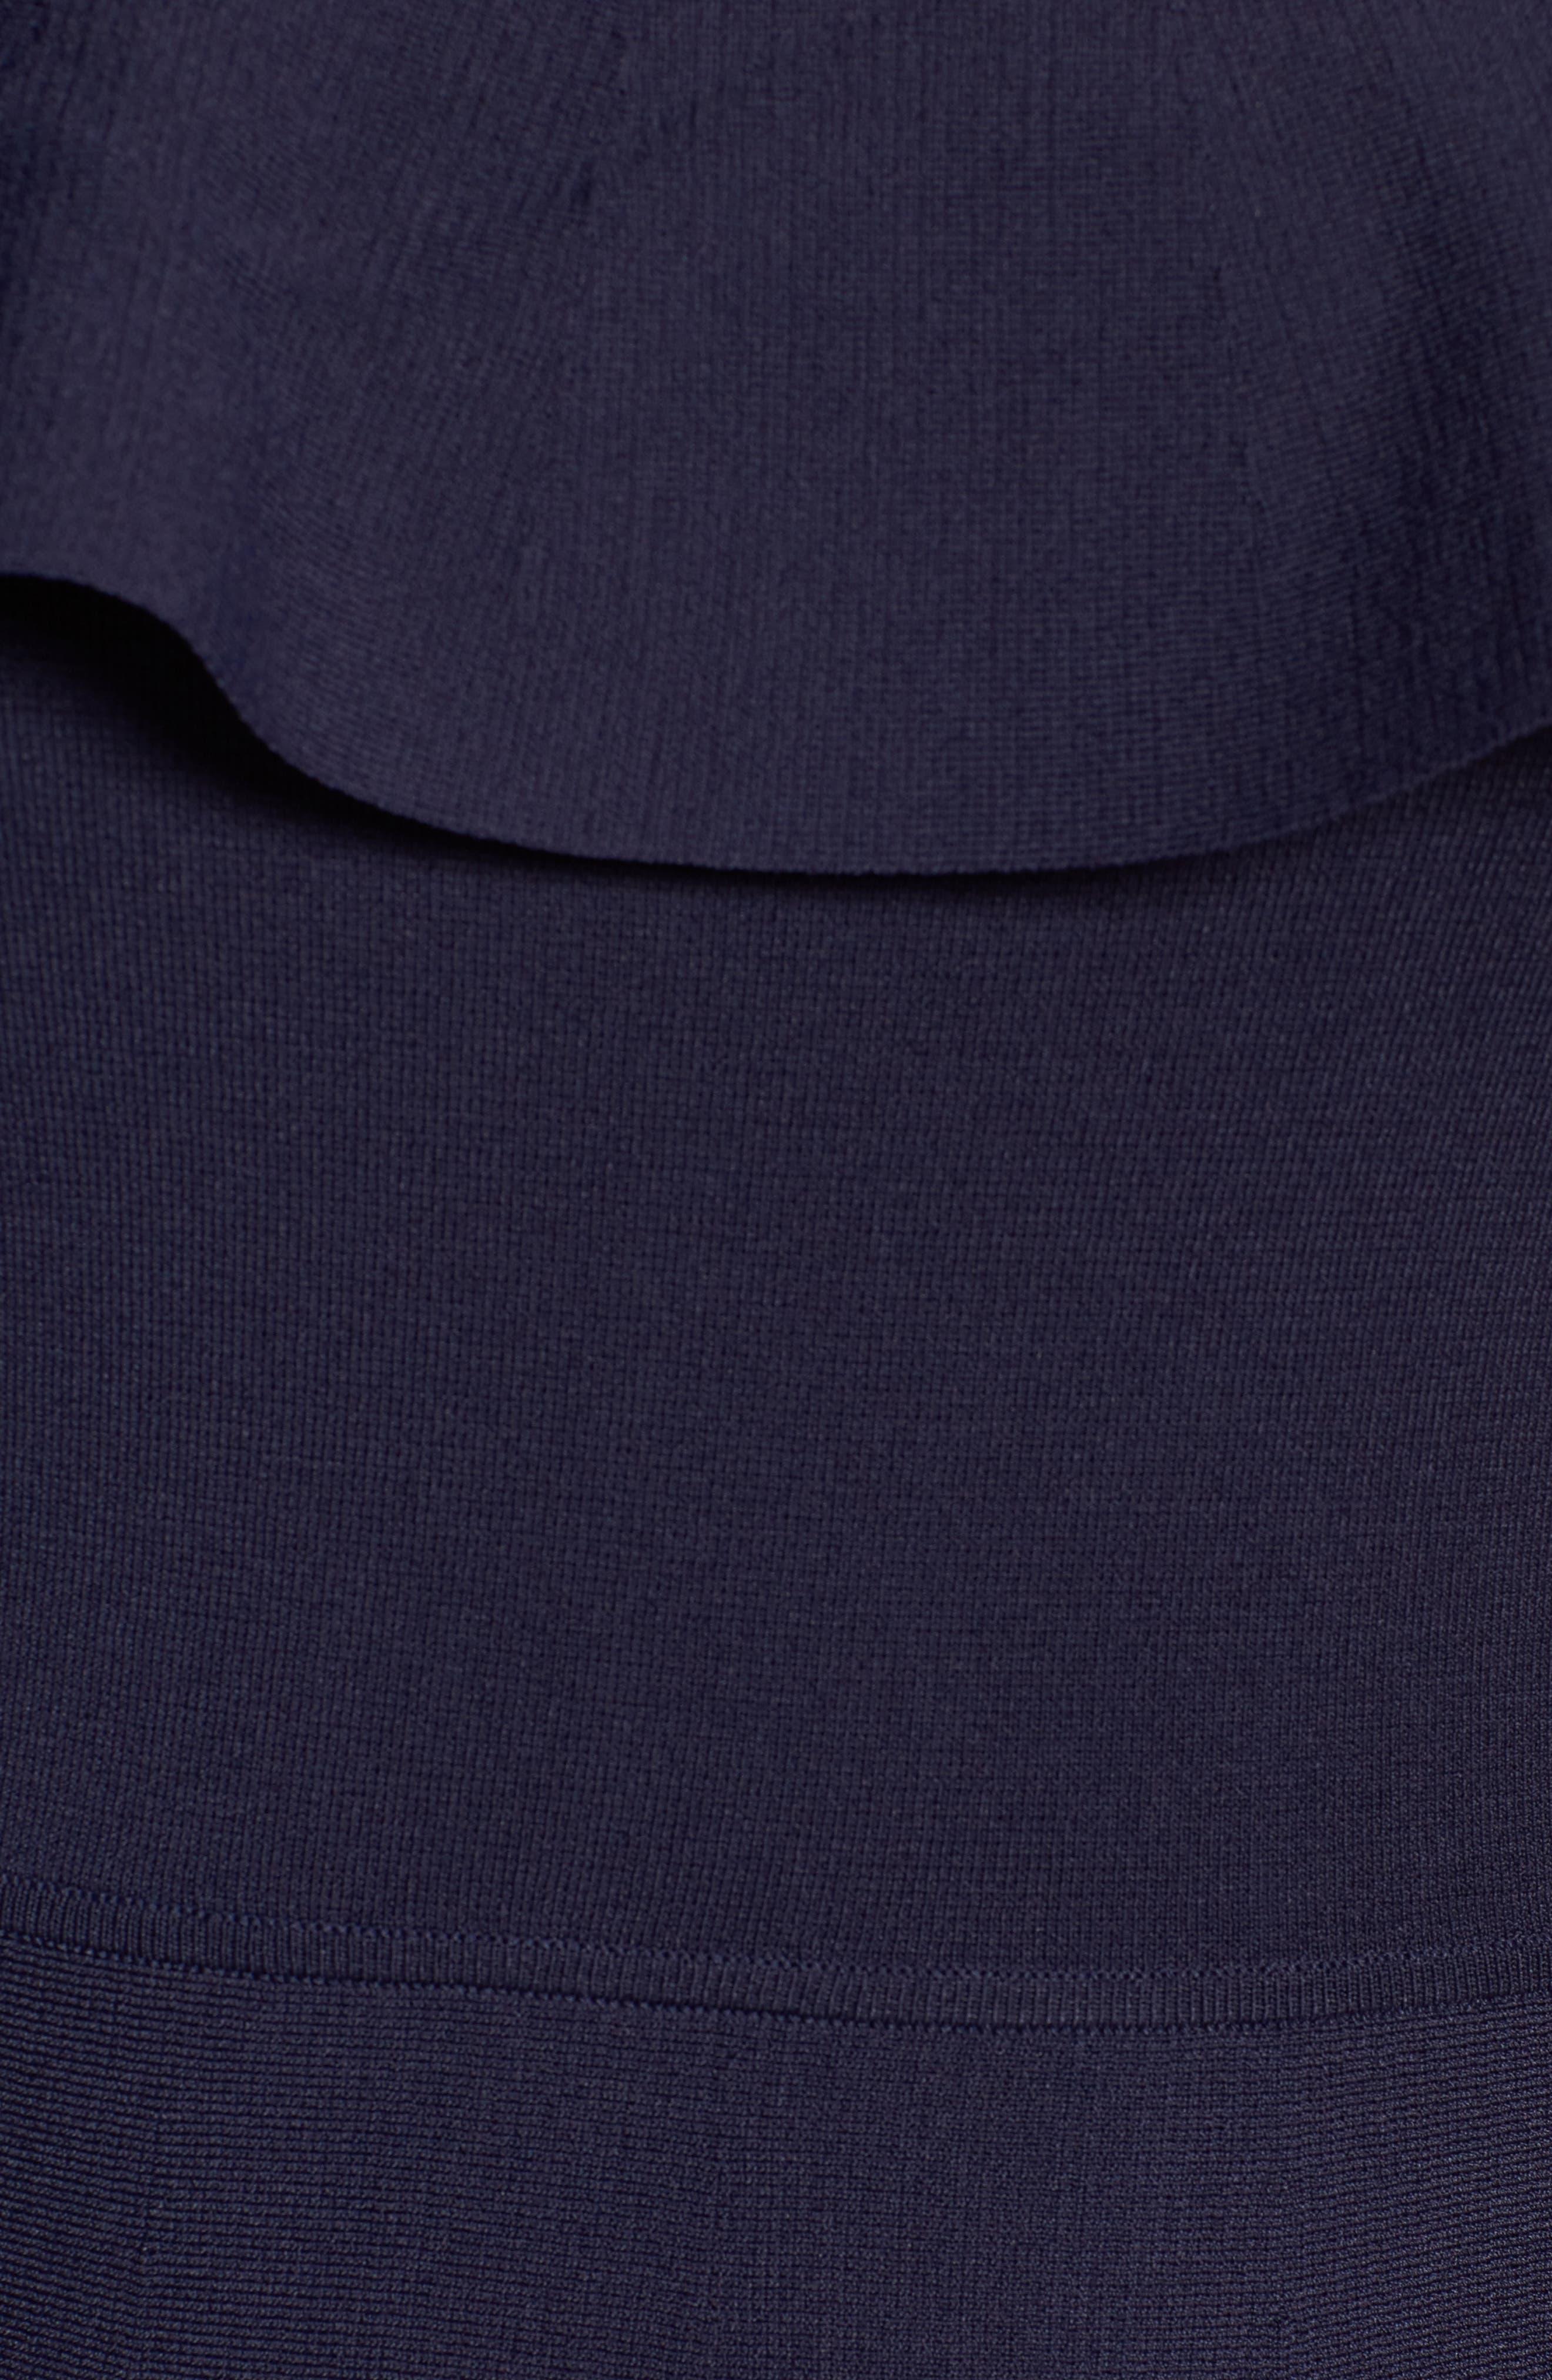 Off the Shoulder Dress,                             Alternate thumbnail 5, color,                             410